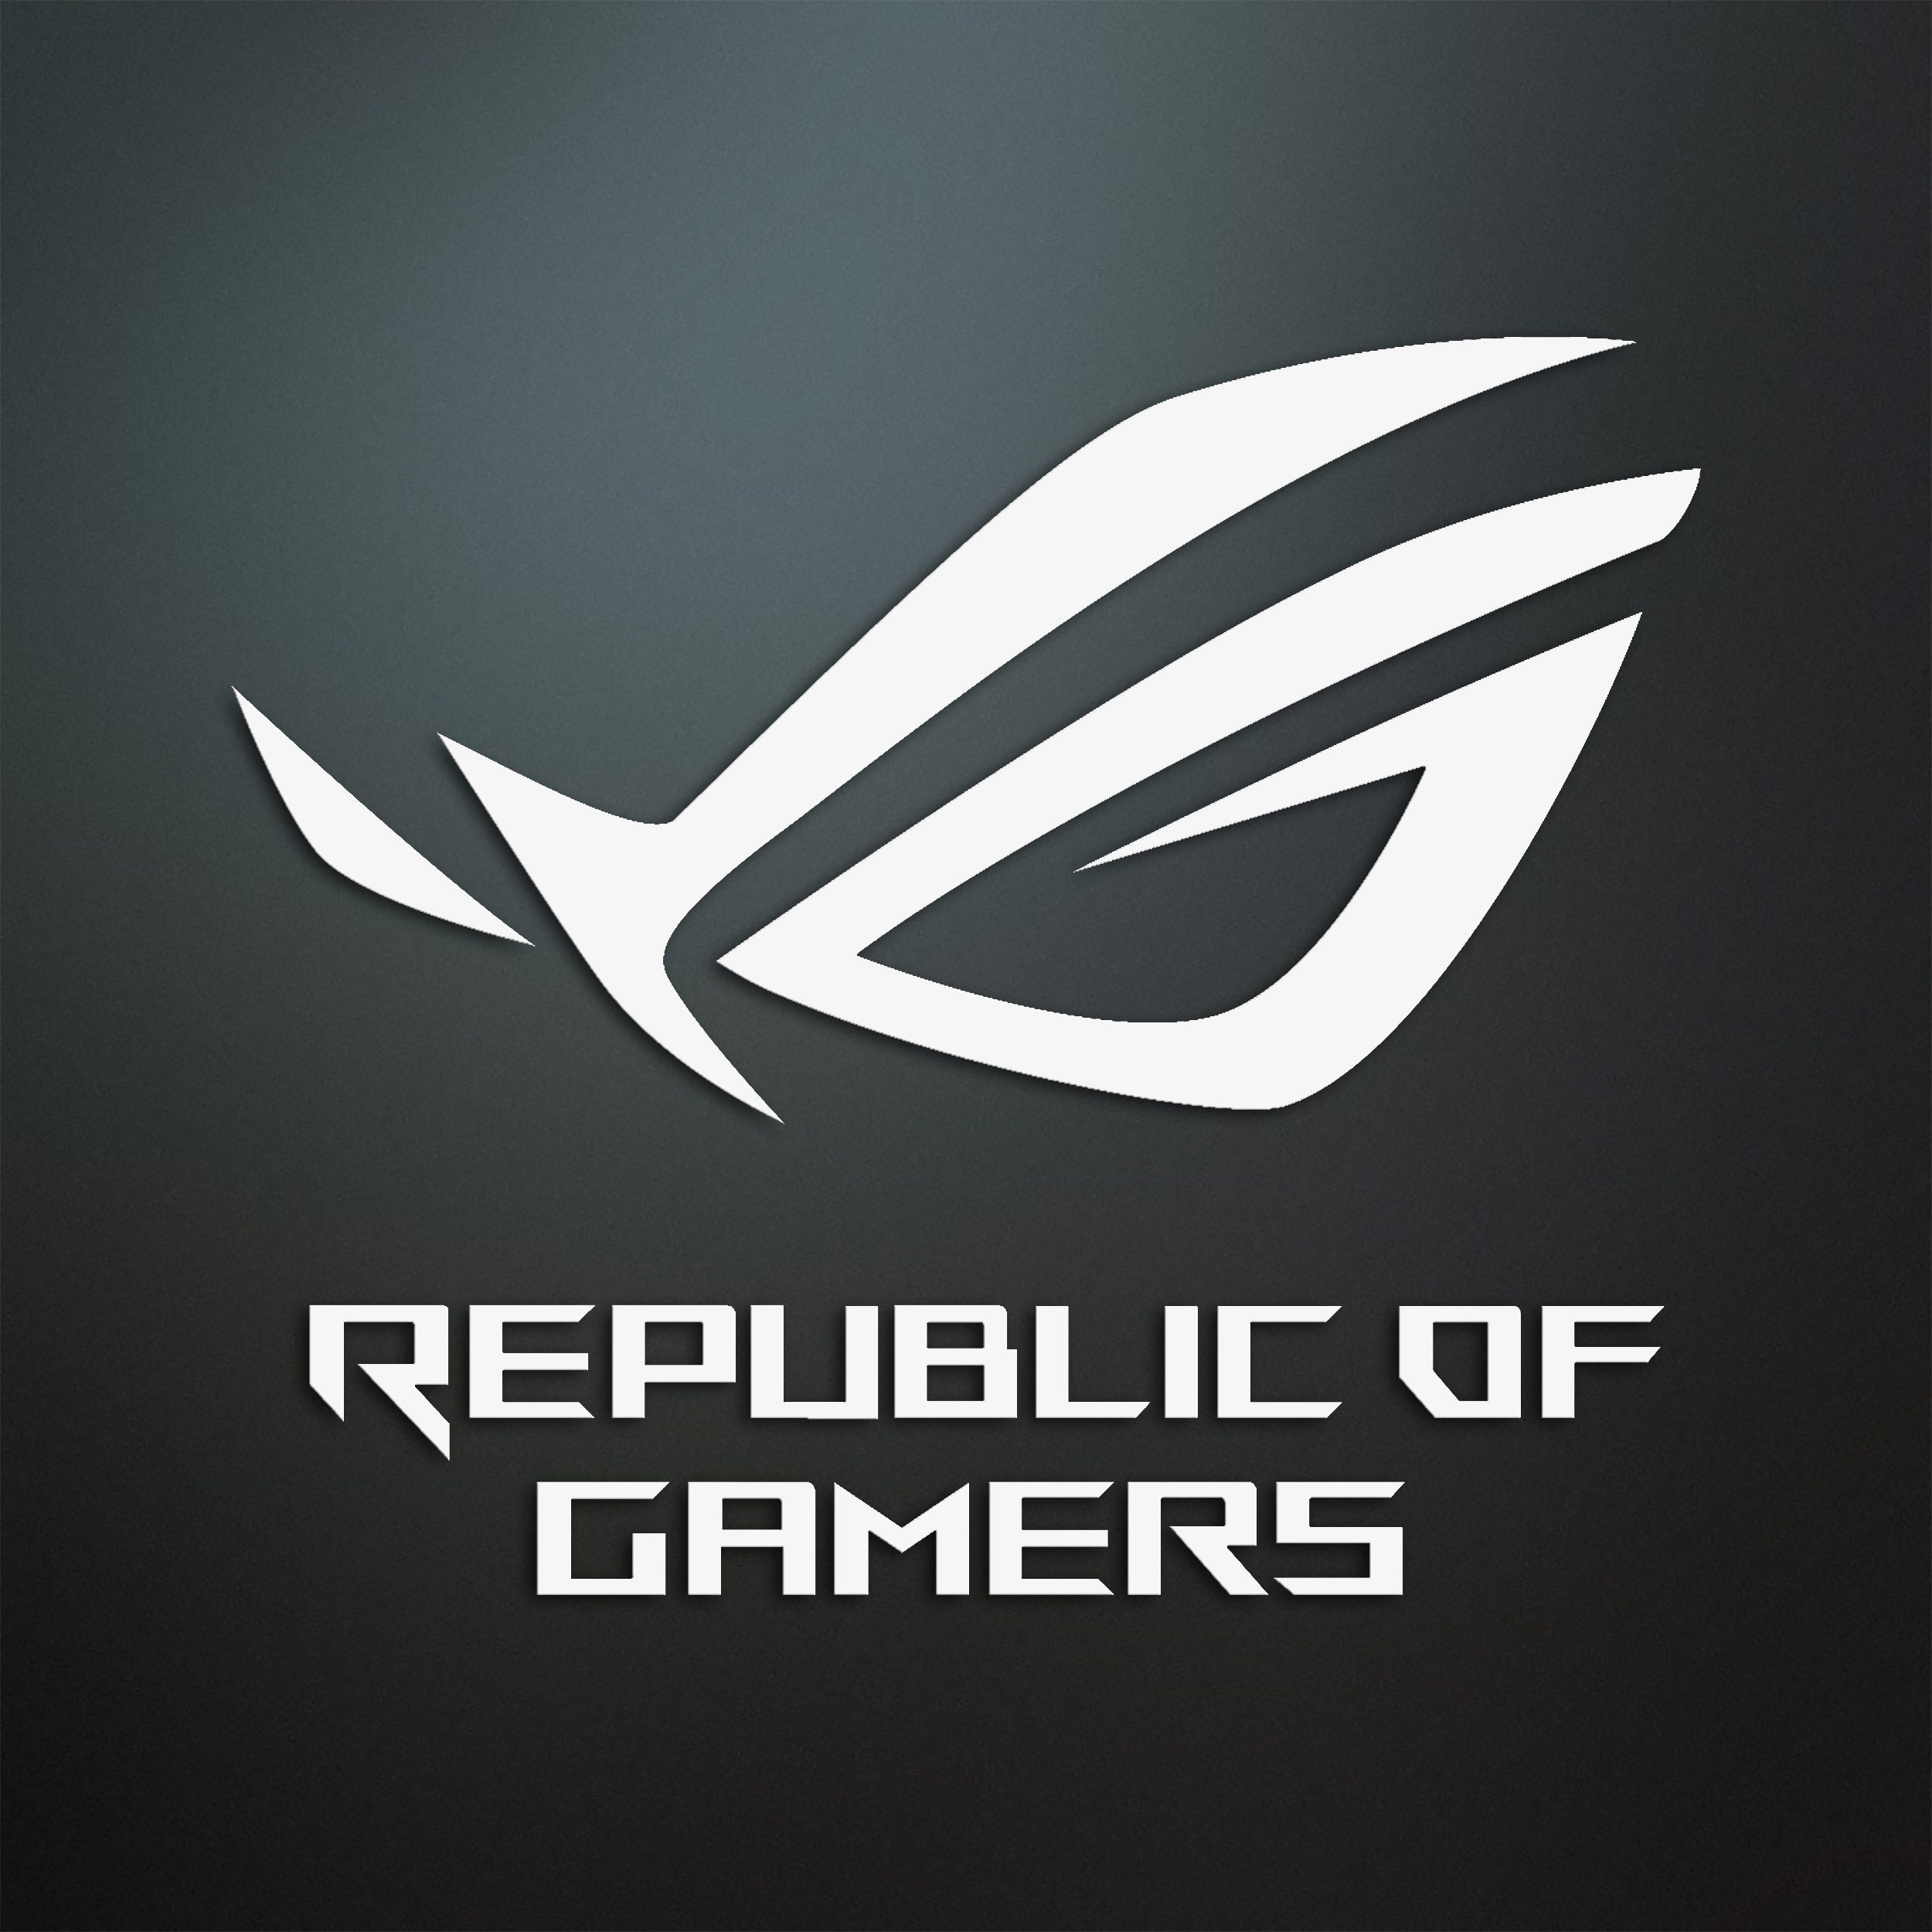 decal 4x ROG republic of gamers vinyl car sticker window laptop ORACAL 651